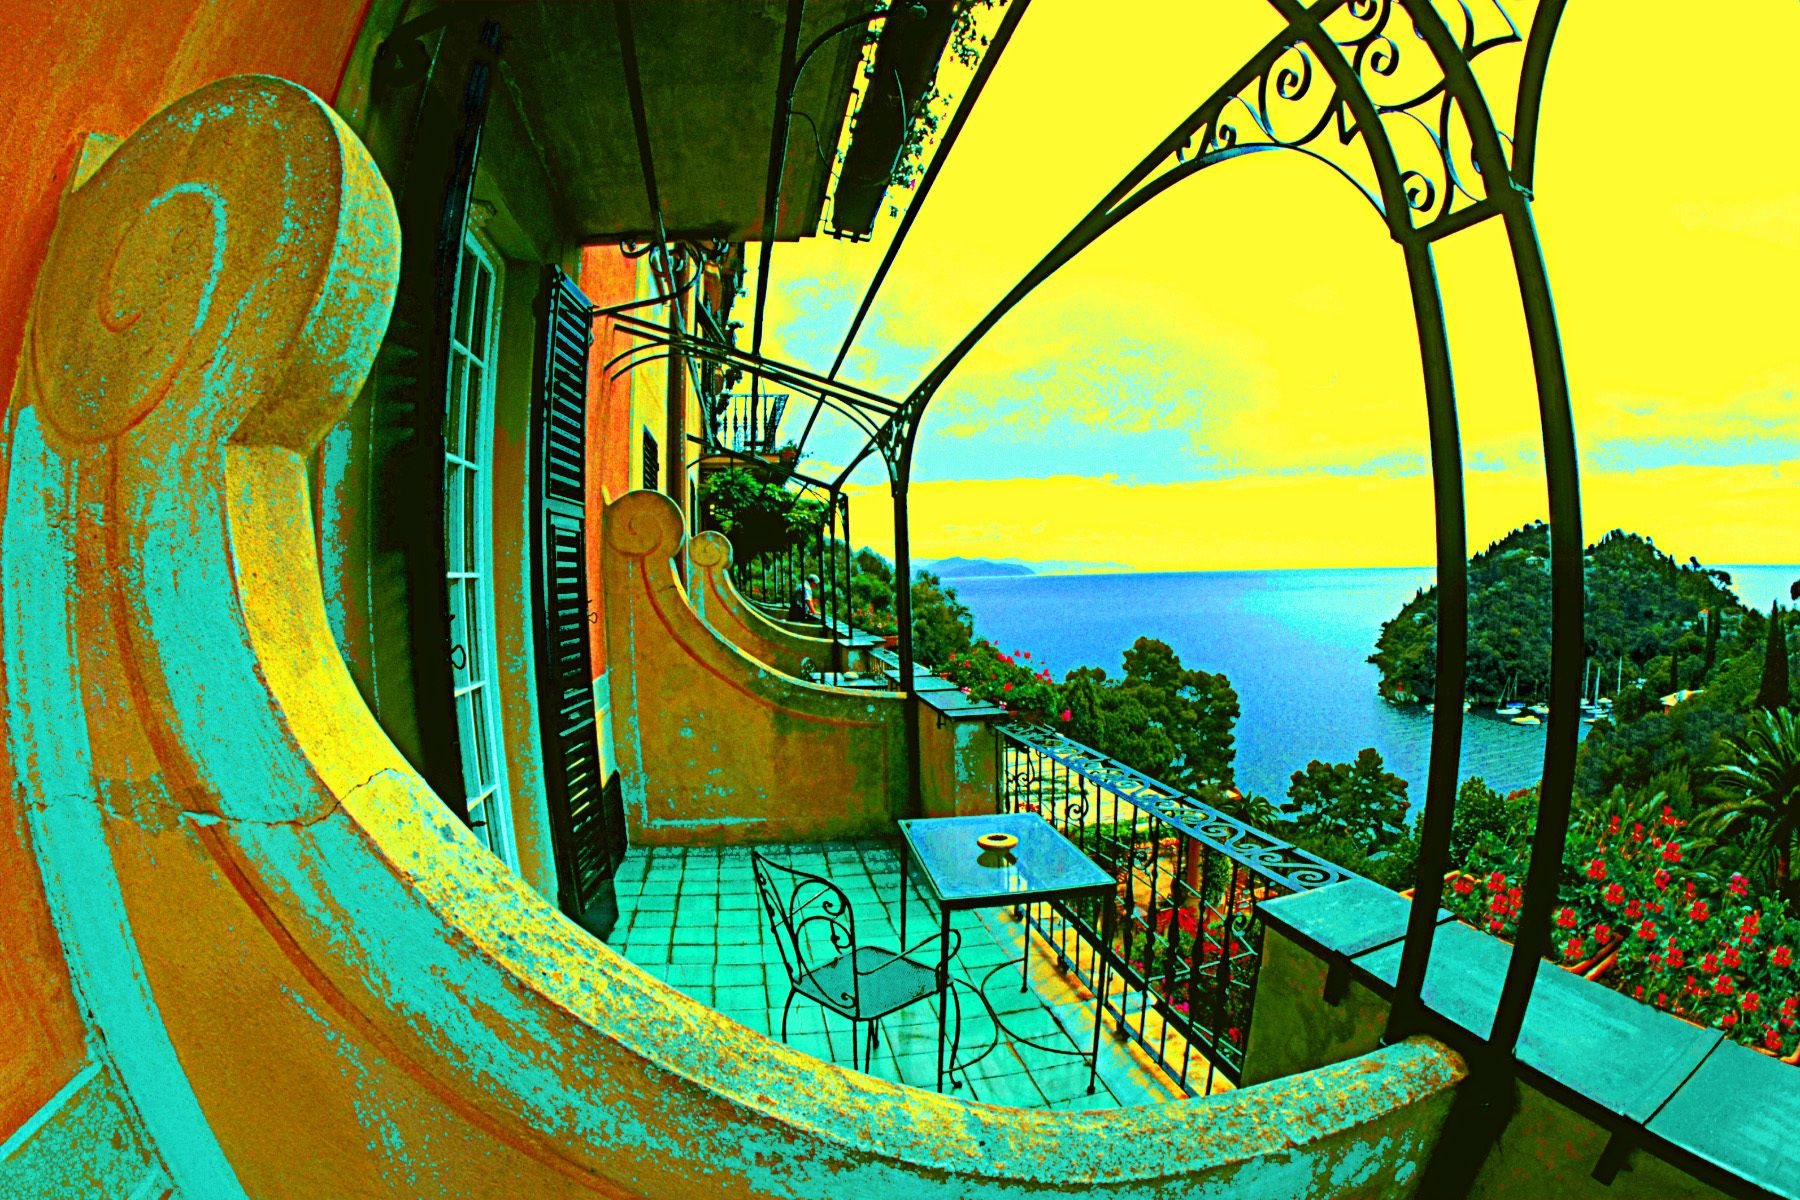 9_0_127_1i_gottlieb_splendido_balcony.jpg